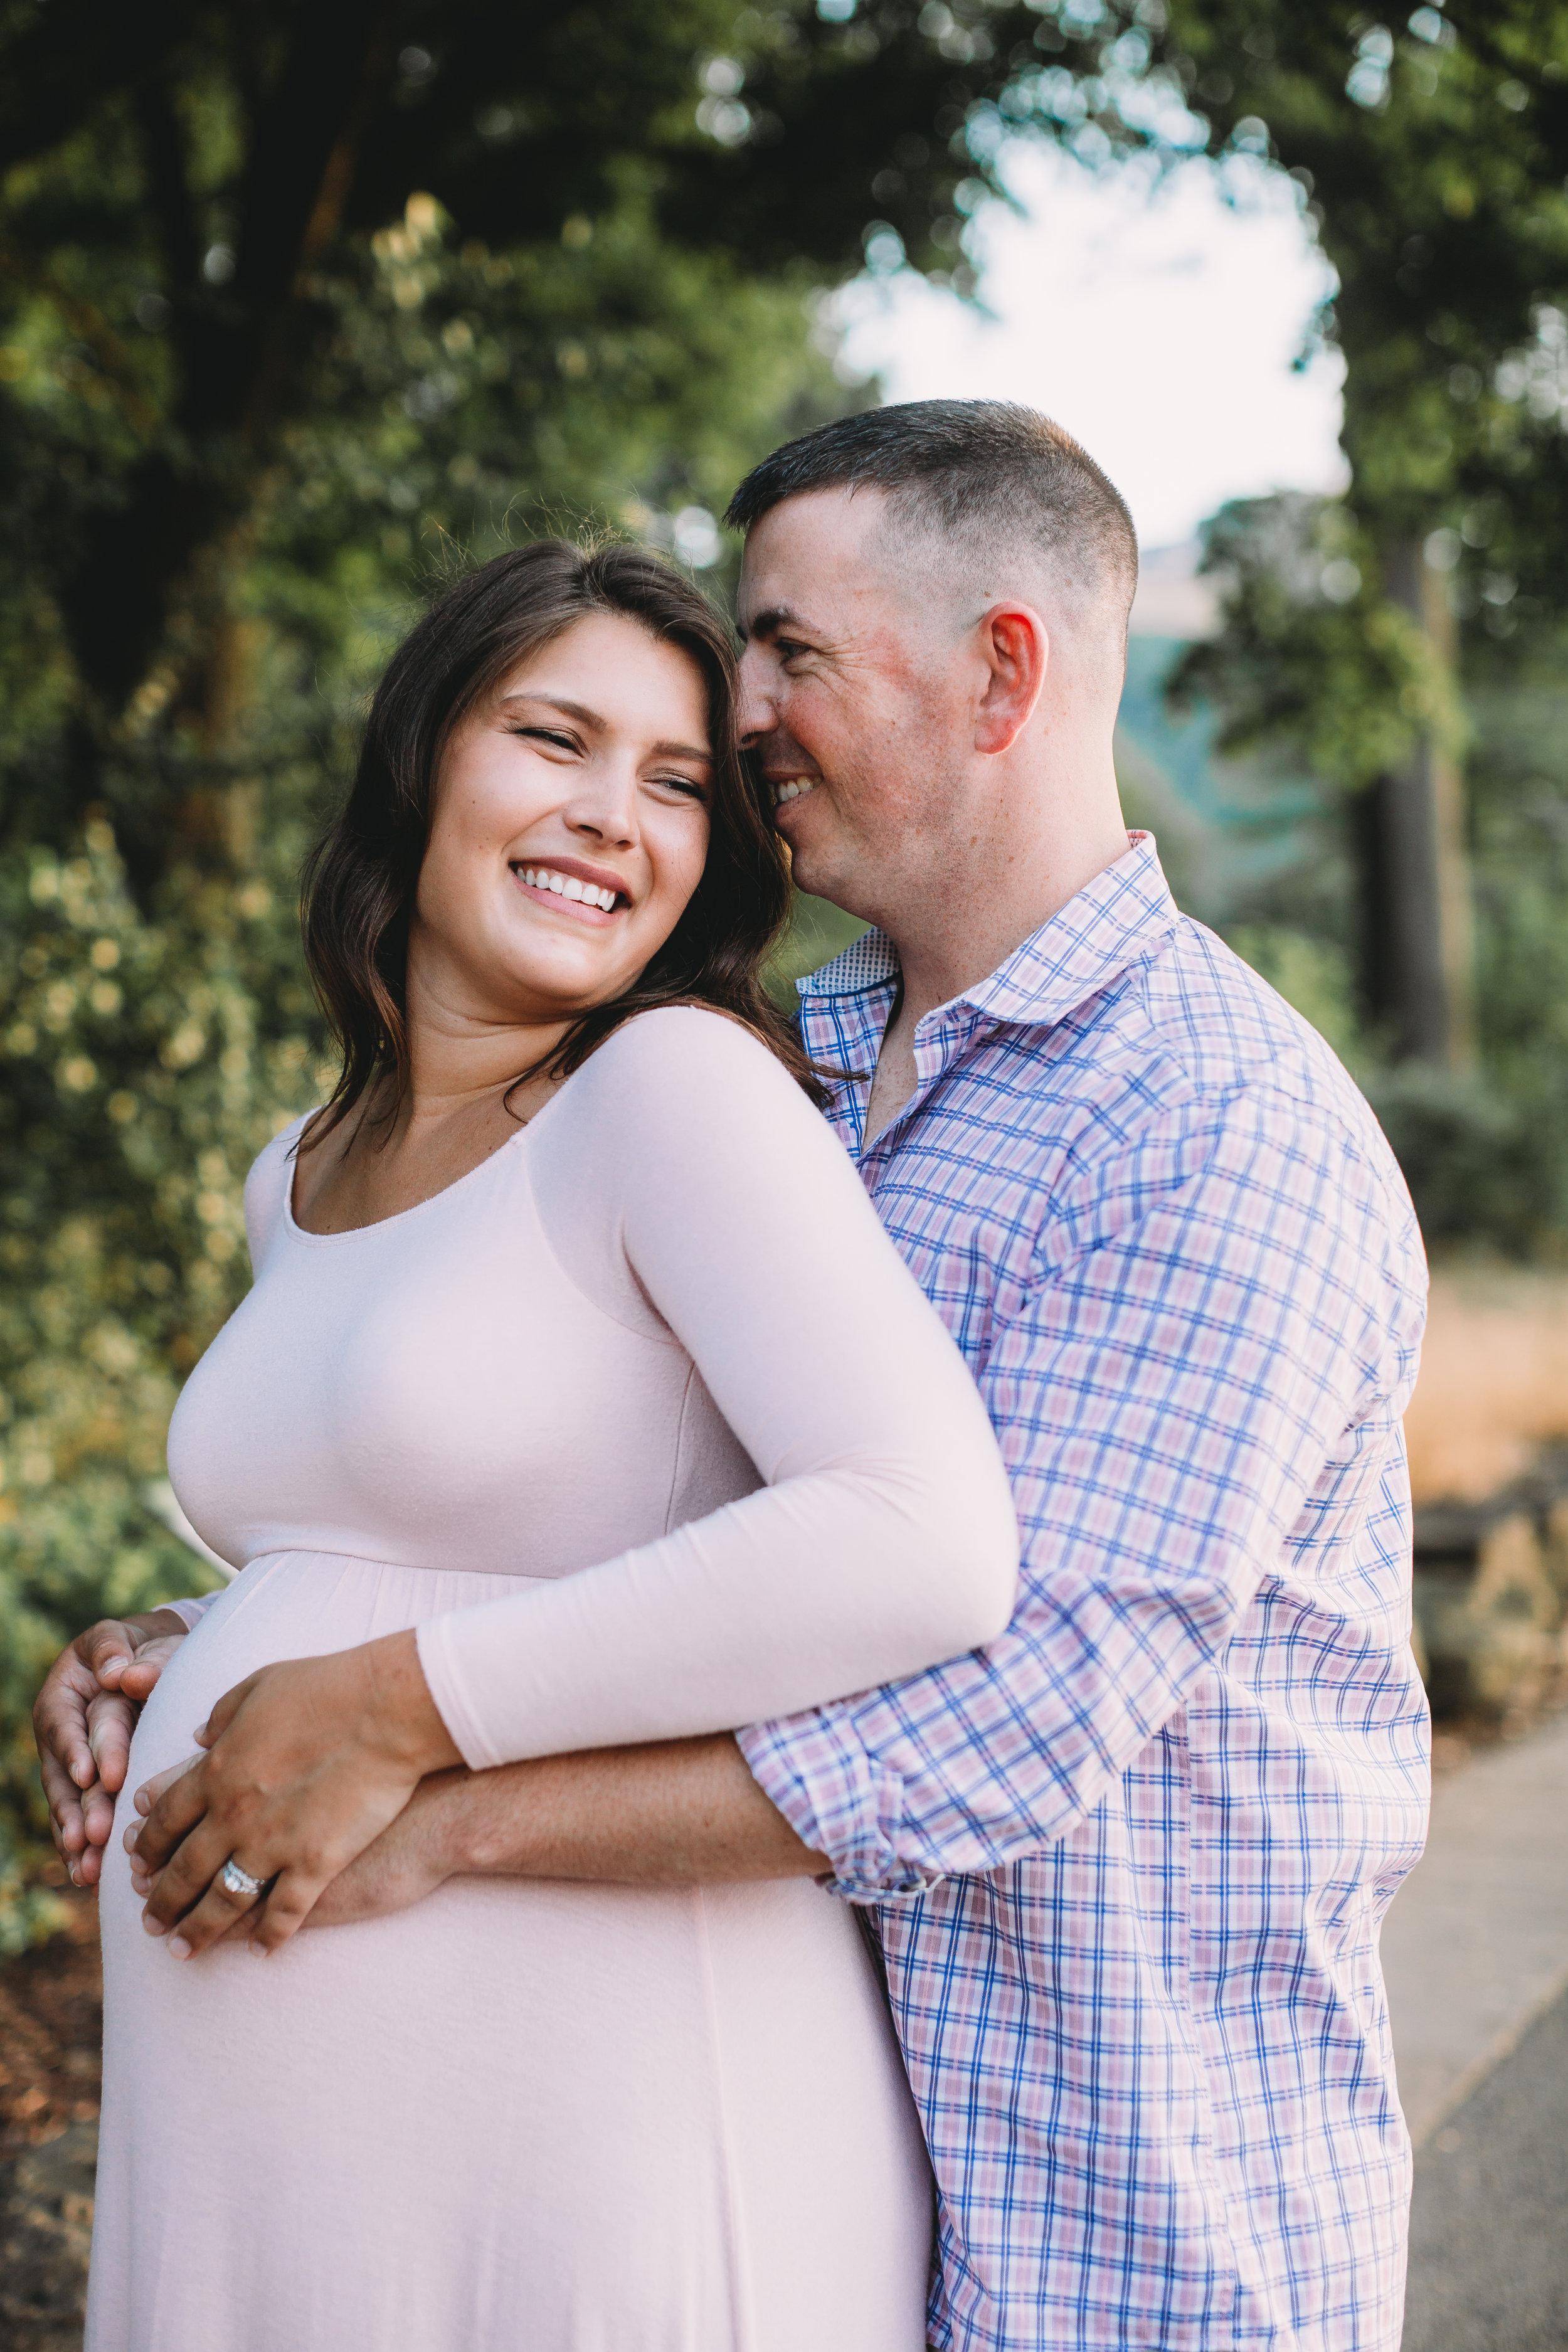 mcnew-maternity-8.jpg